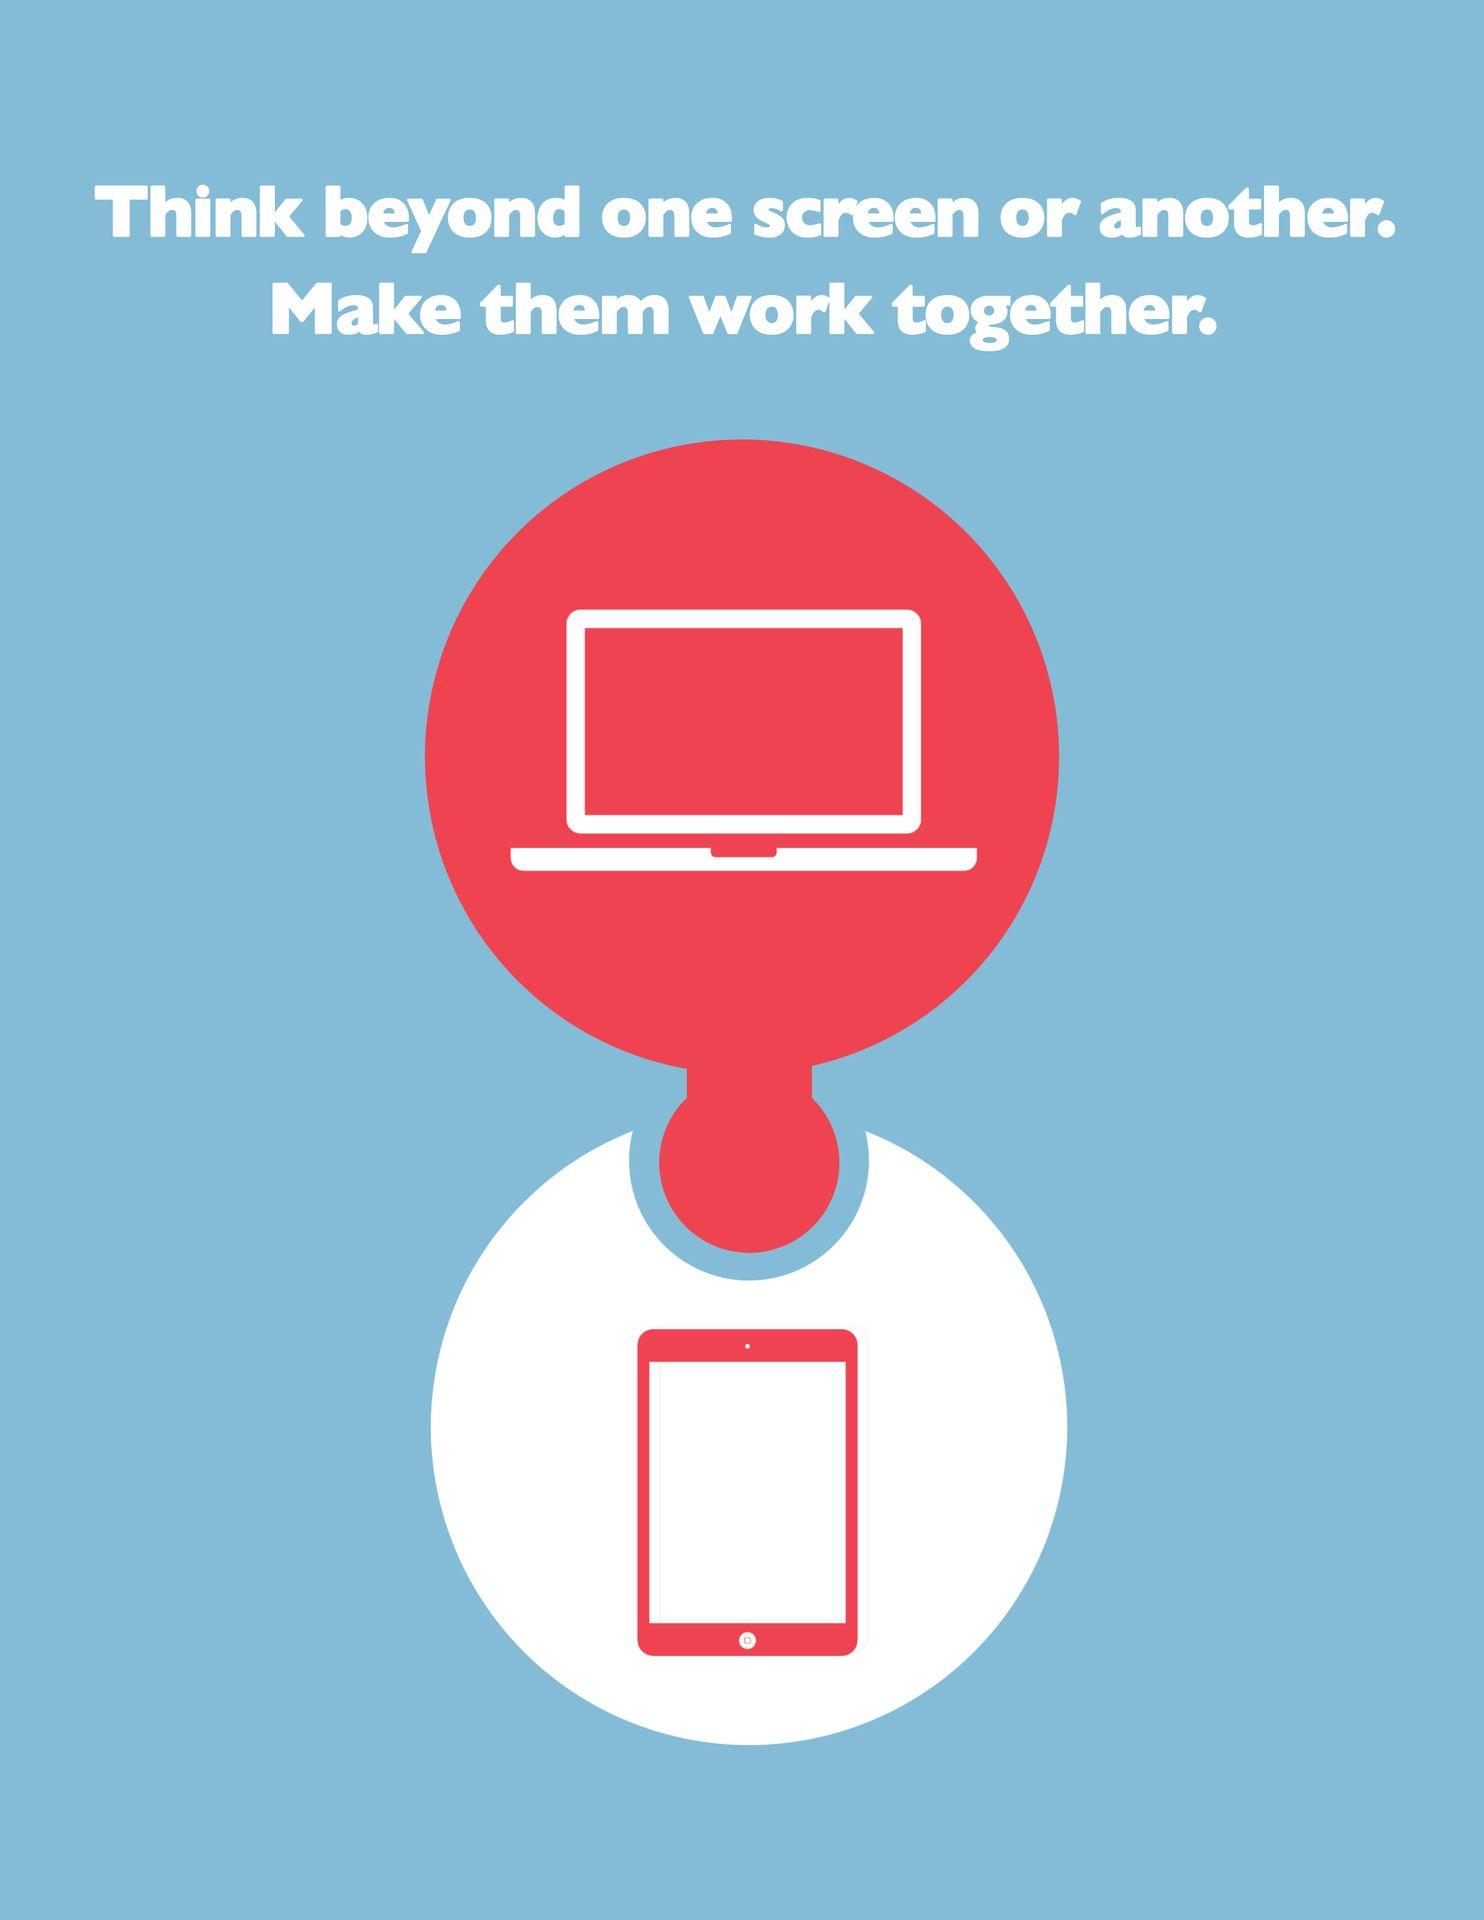 Digital Direct. Mobile + Desktop = Success